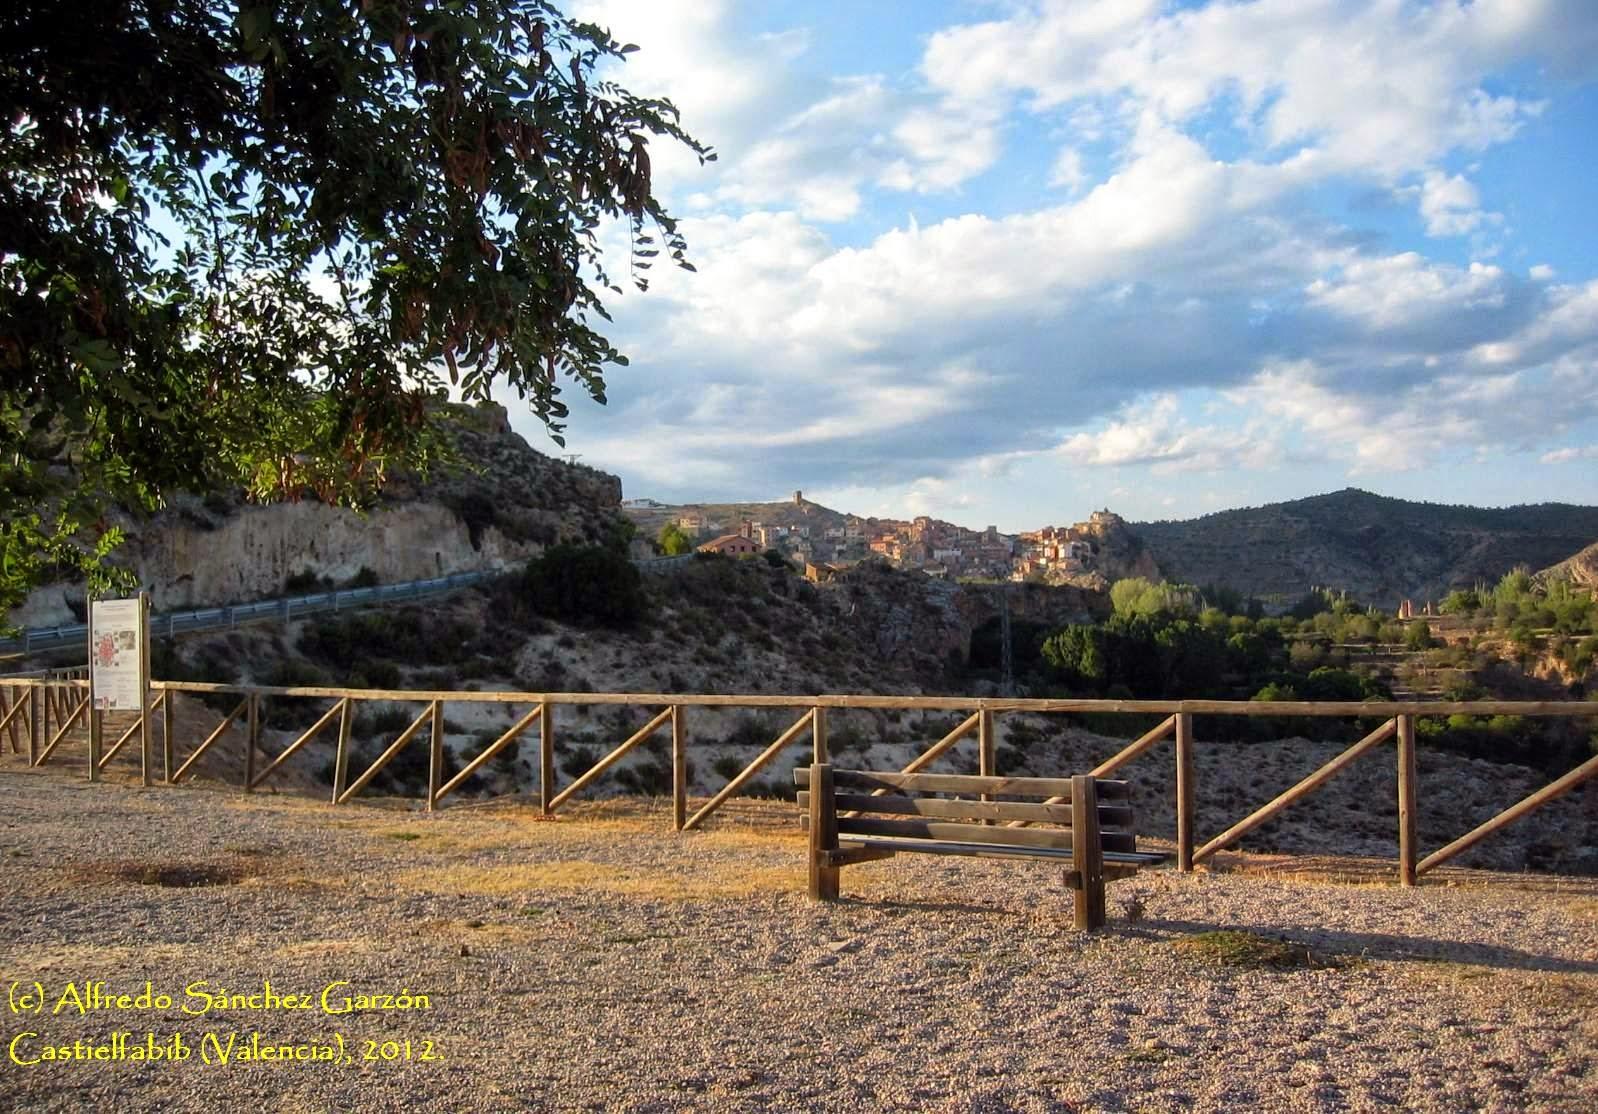 castielfabib-valencia-vista-mirador